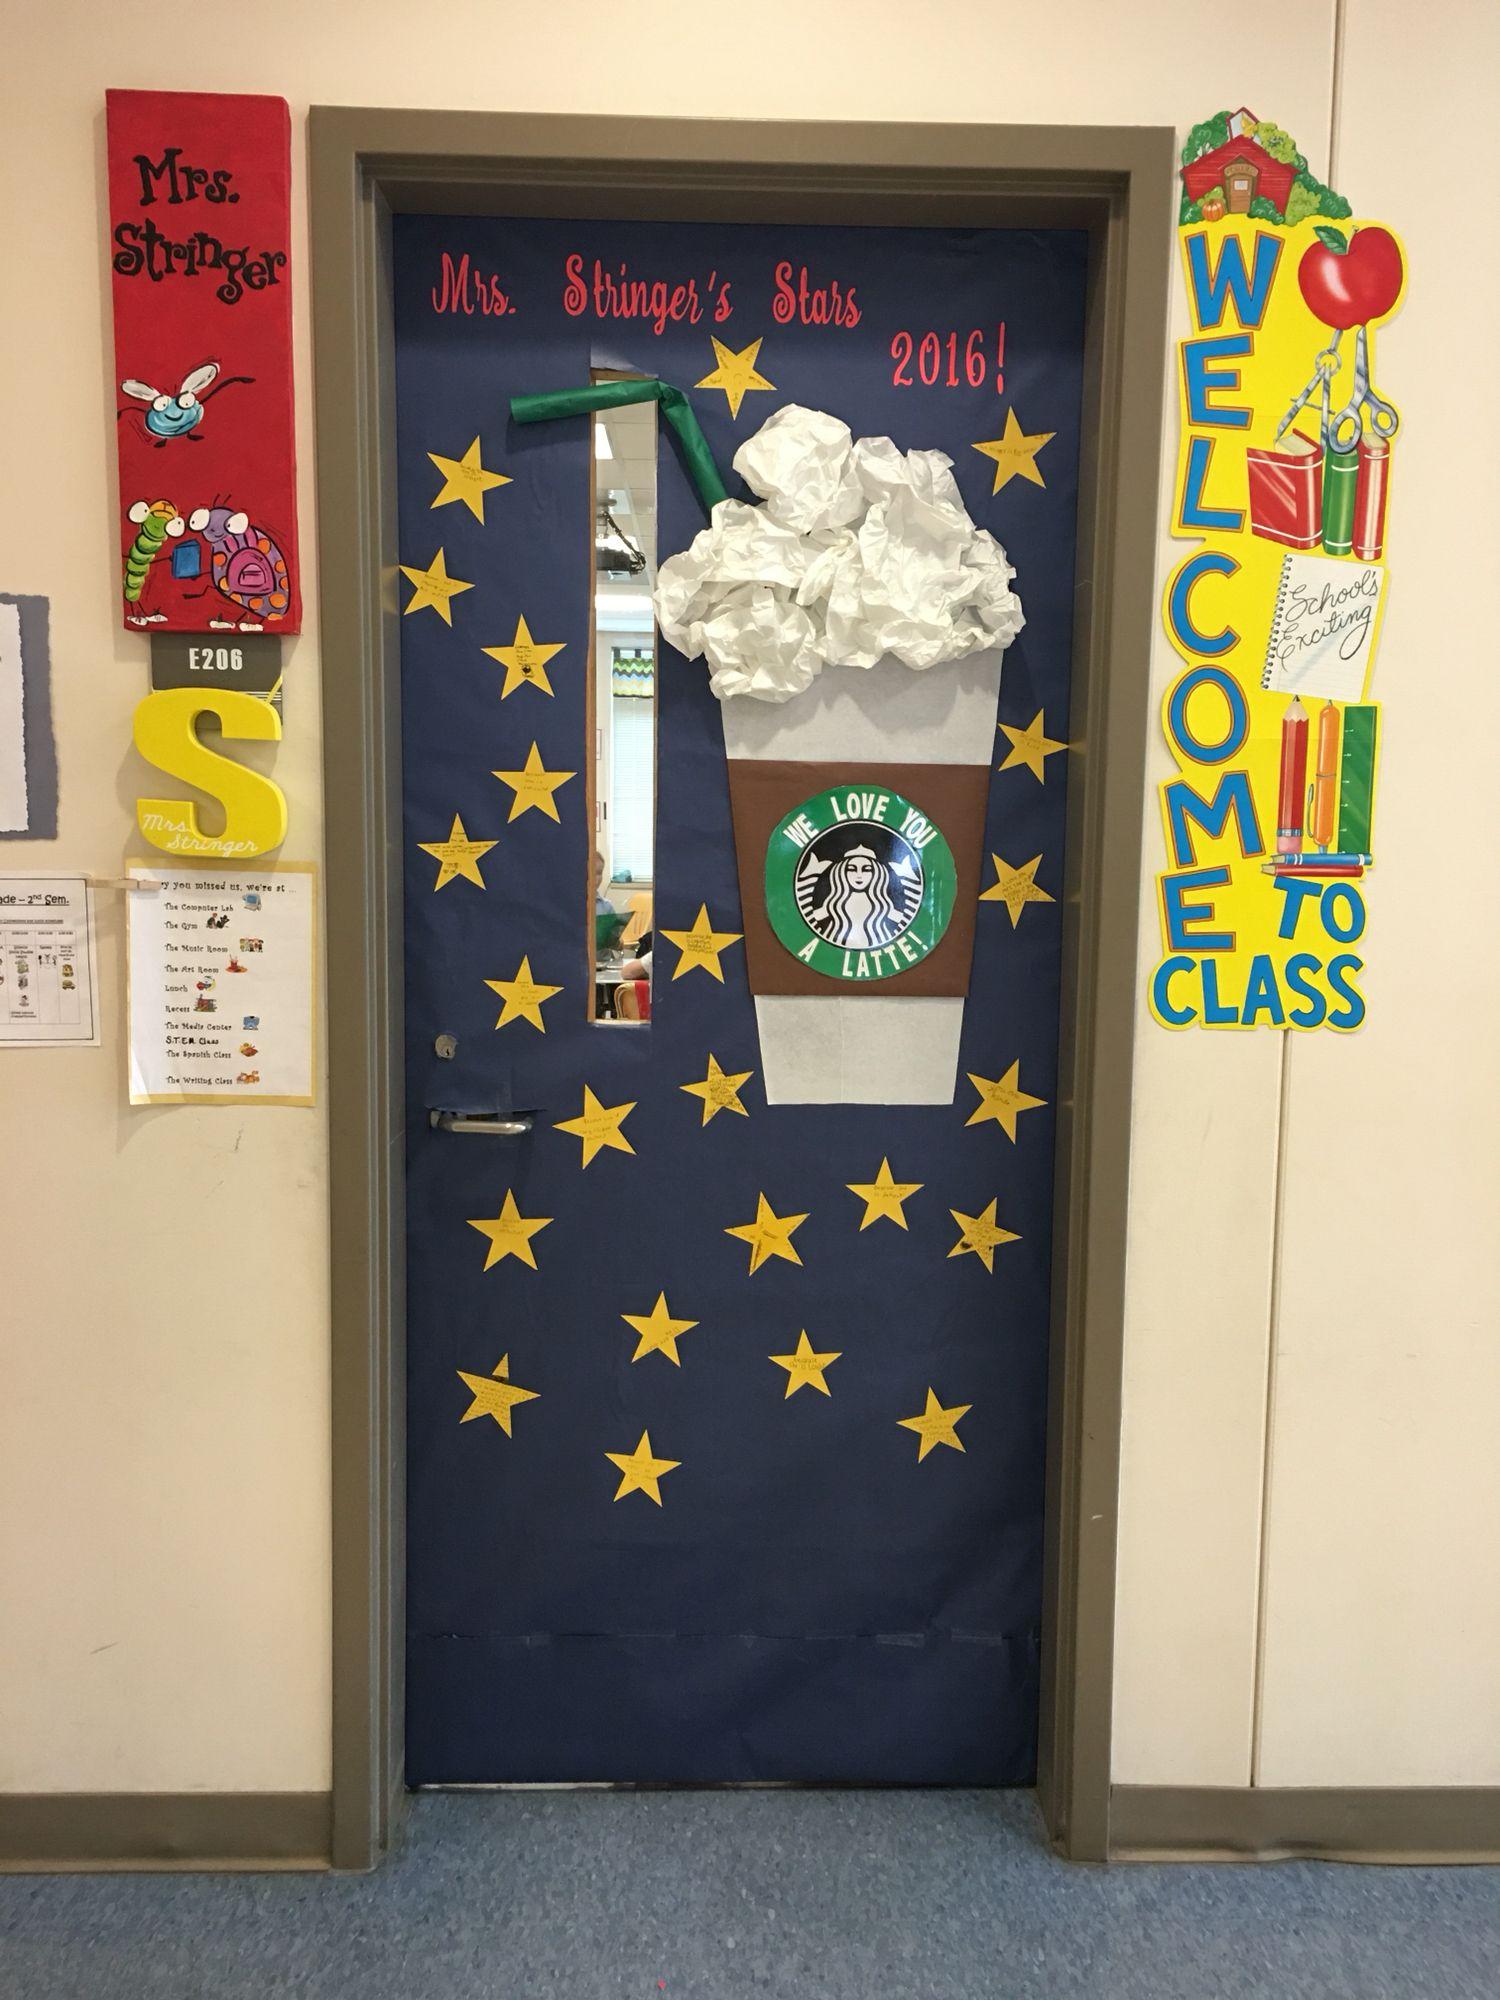 Starbucks Theme Door. We Love You A Latte! Stars Are Hand